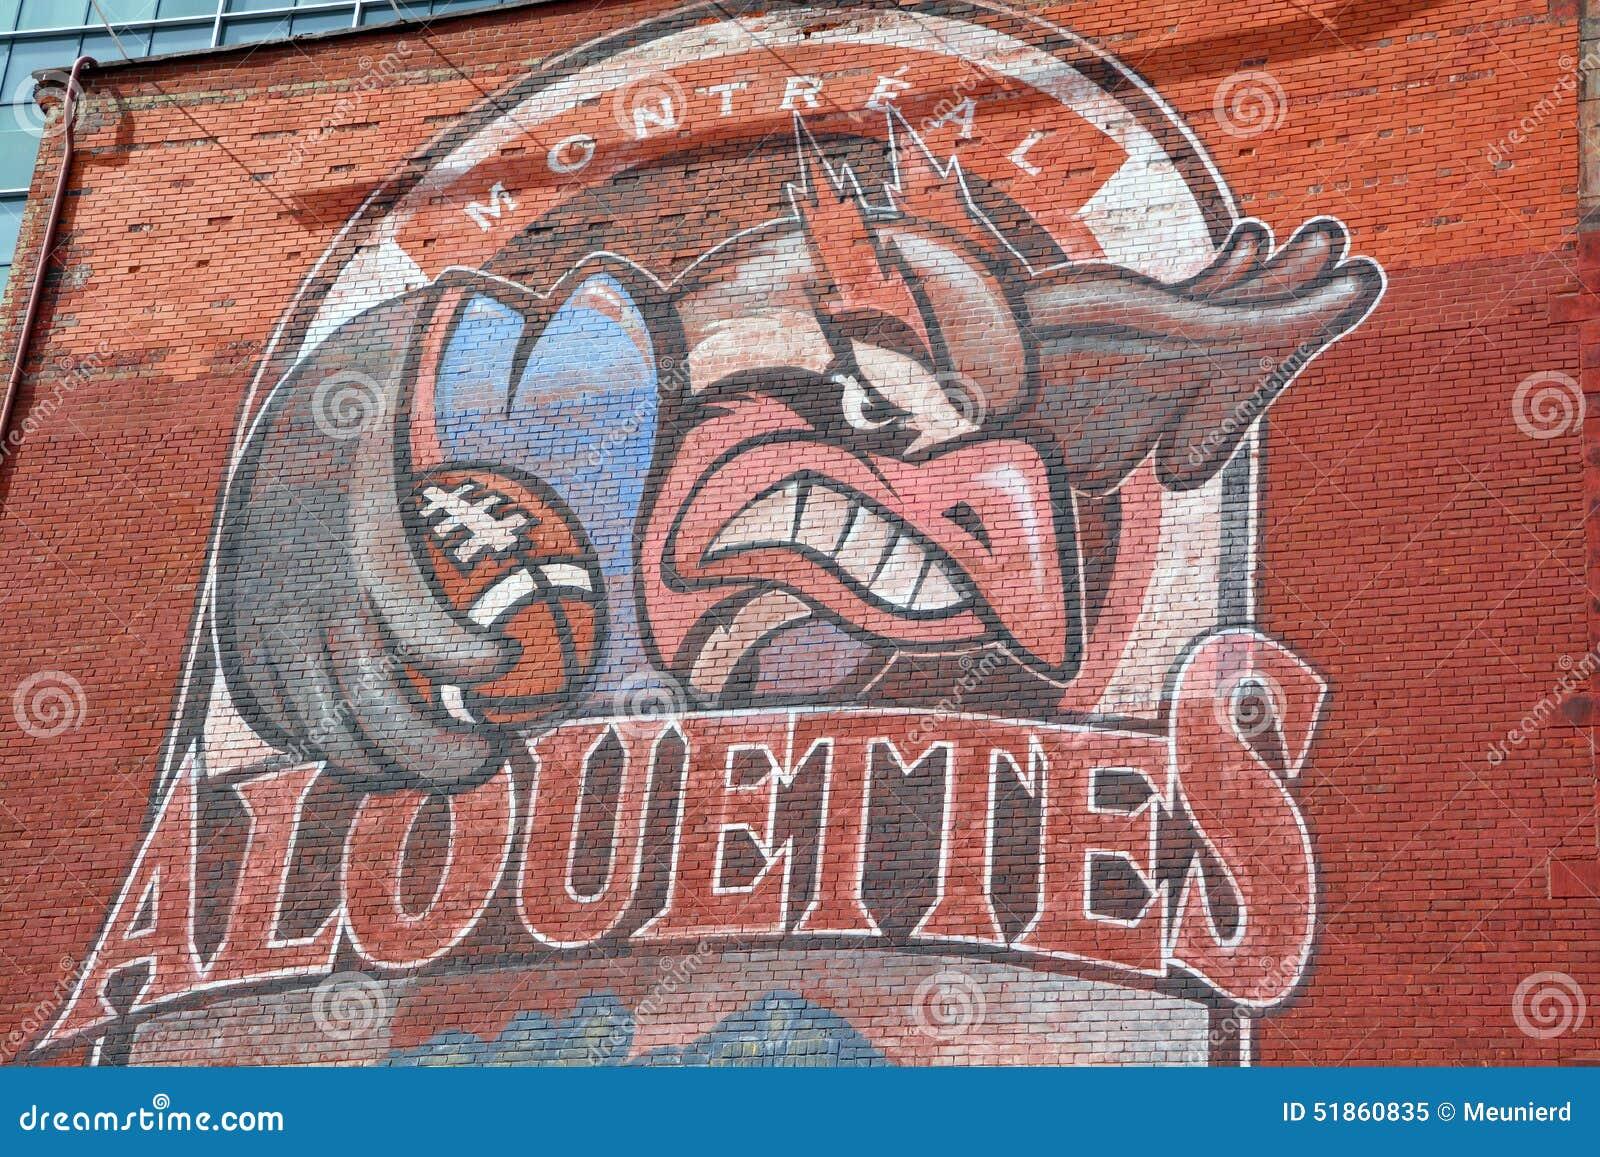 Street art Montreal Alouettes